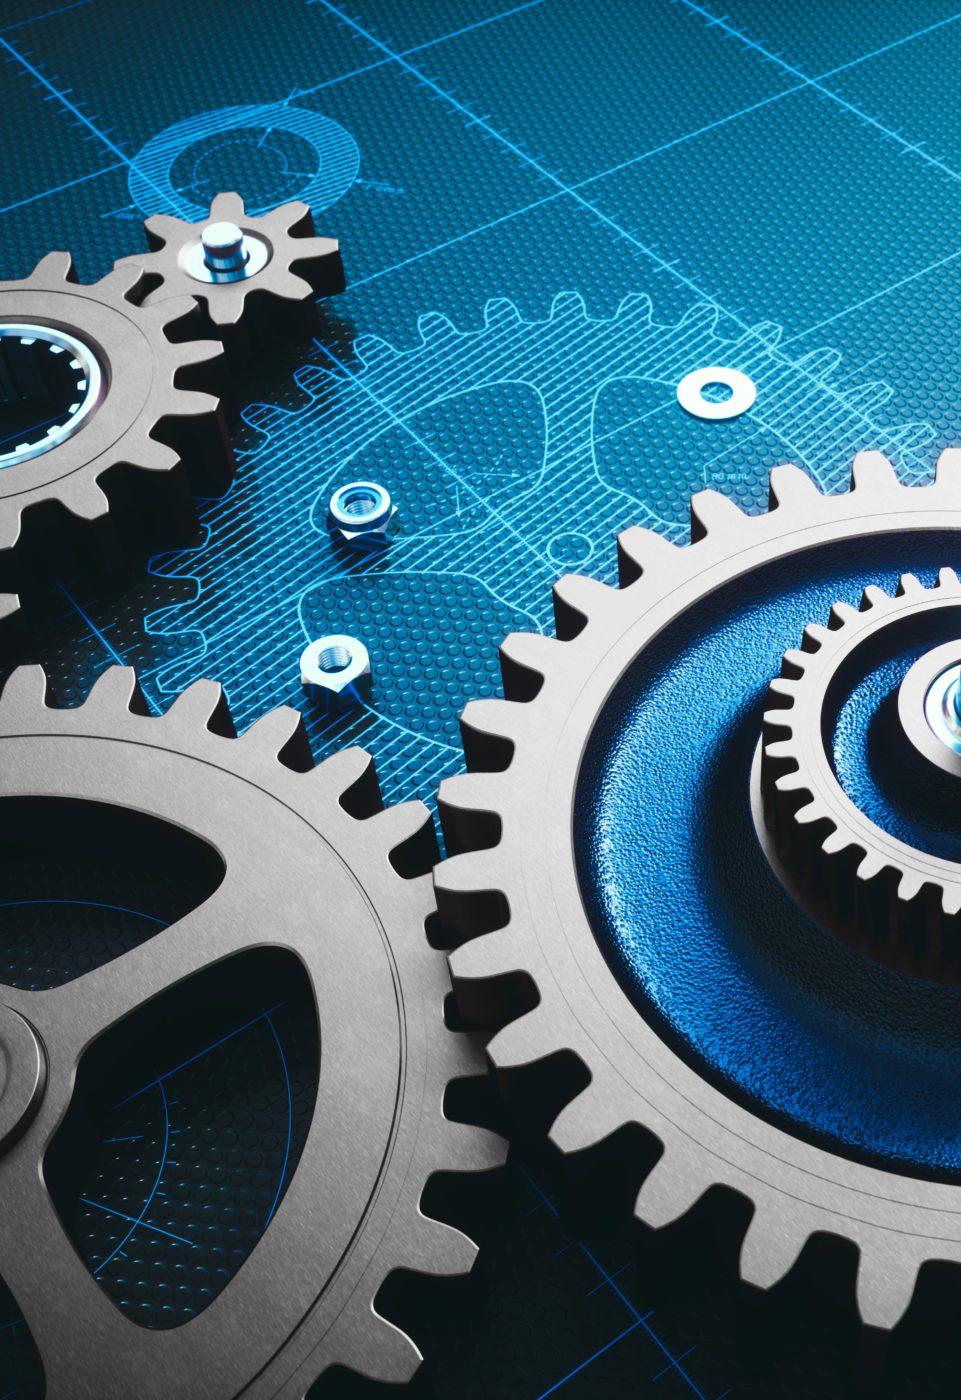 Digital Manufacturing - Title